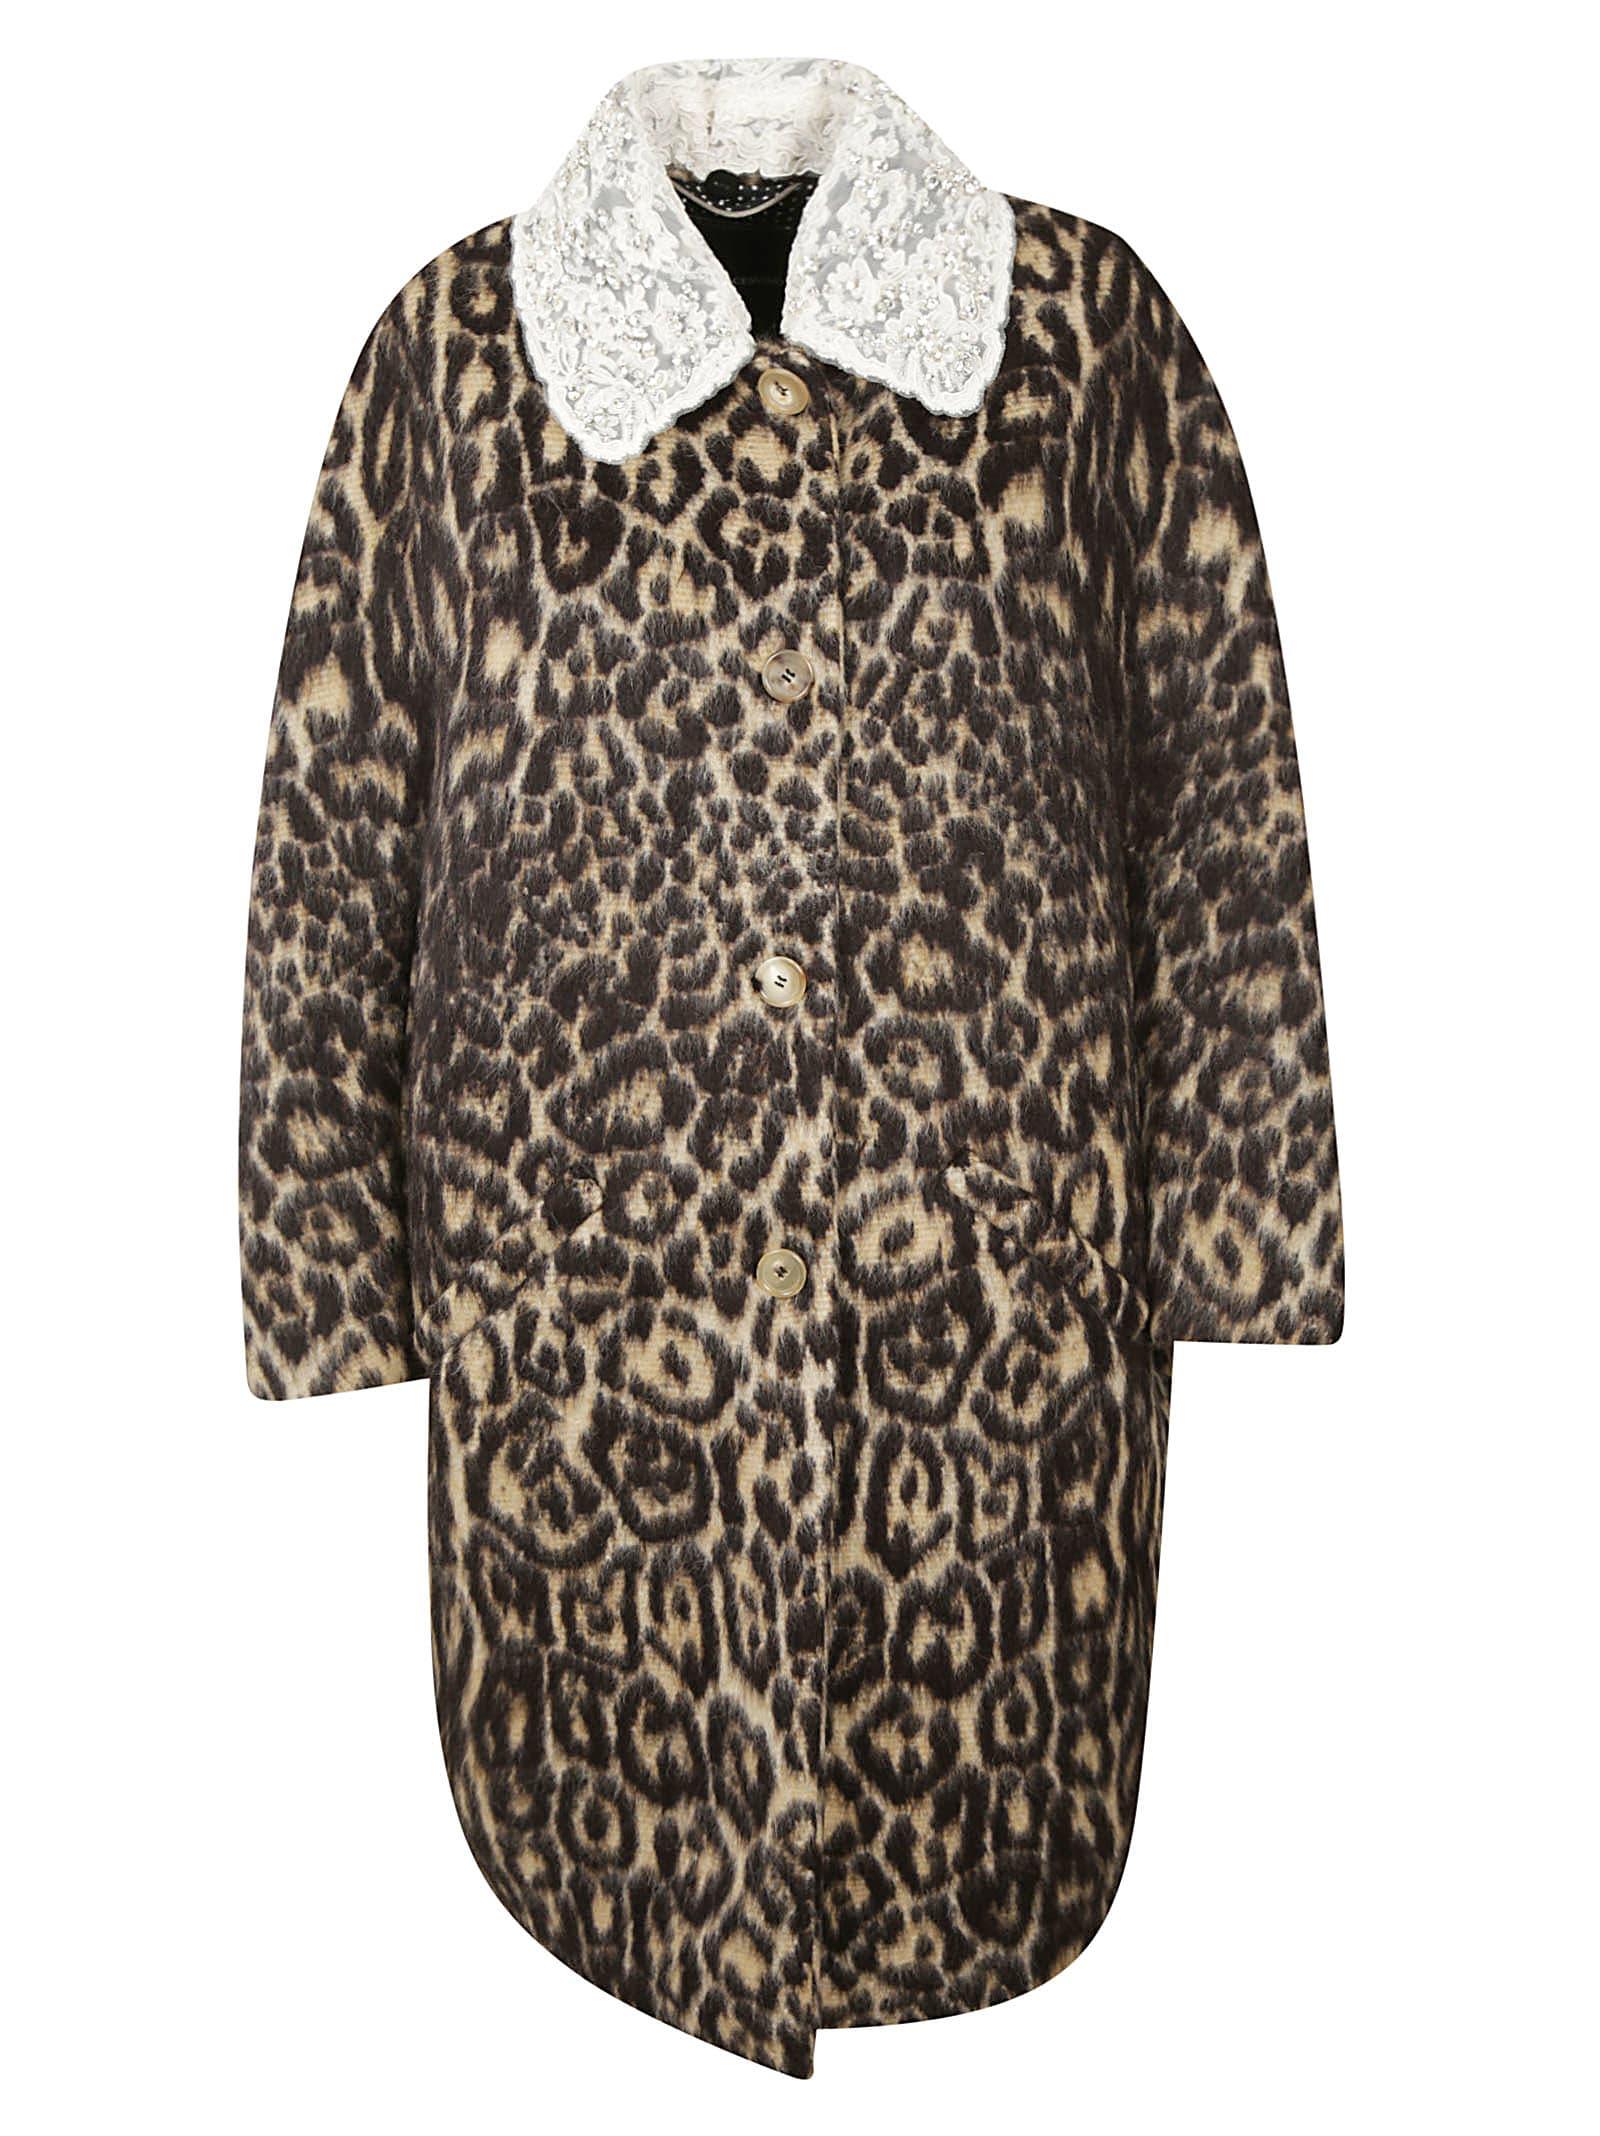 Ermanno Scervino Leopard Printed Coat